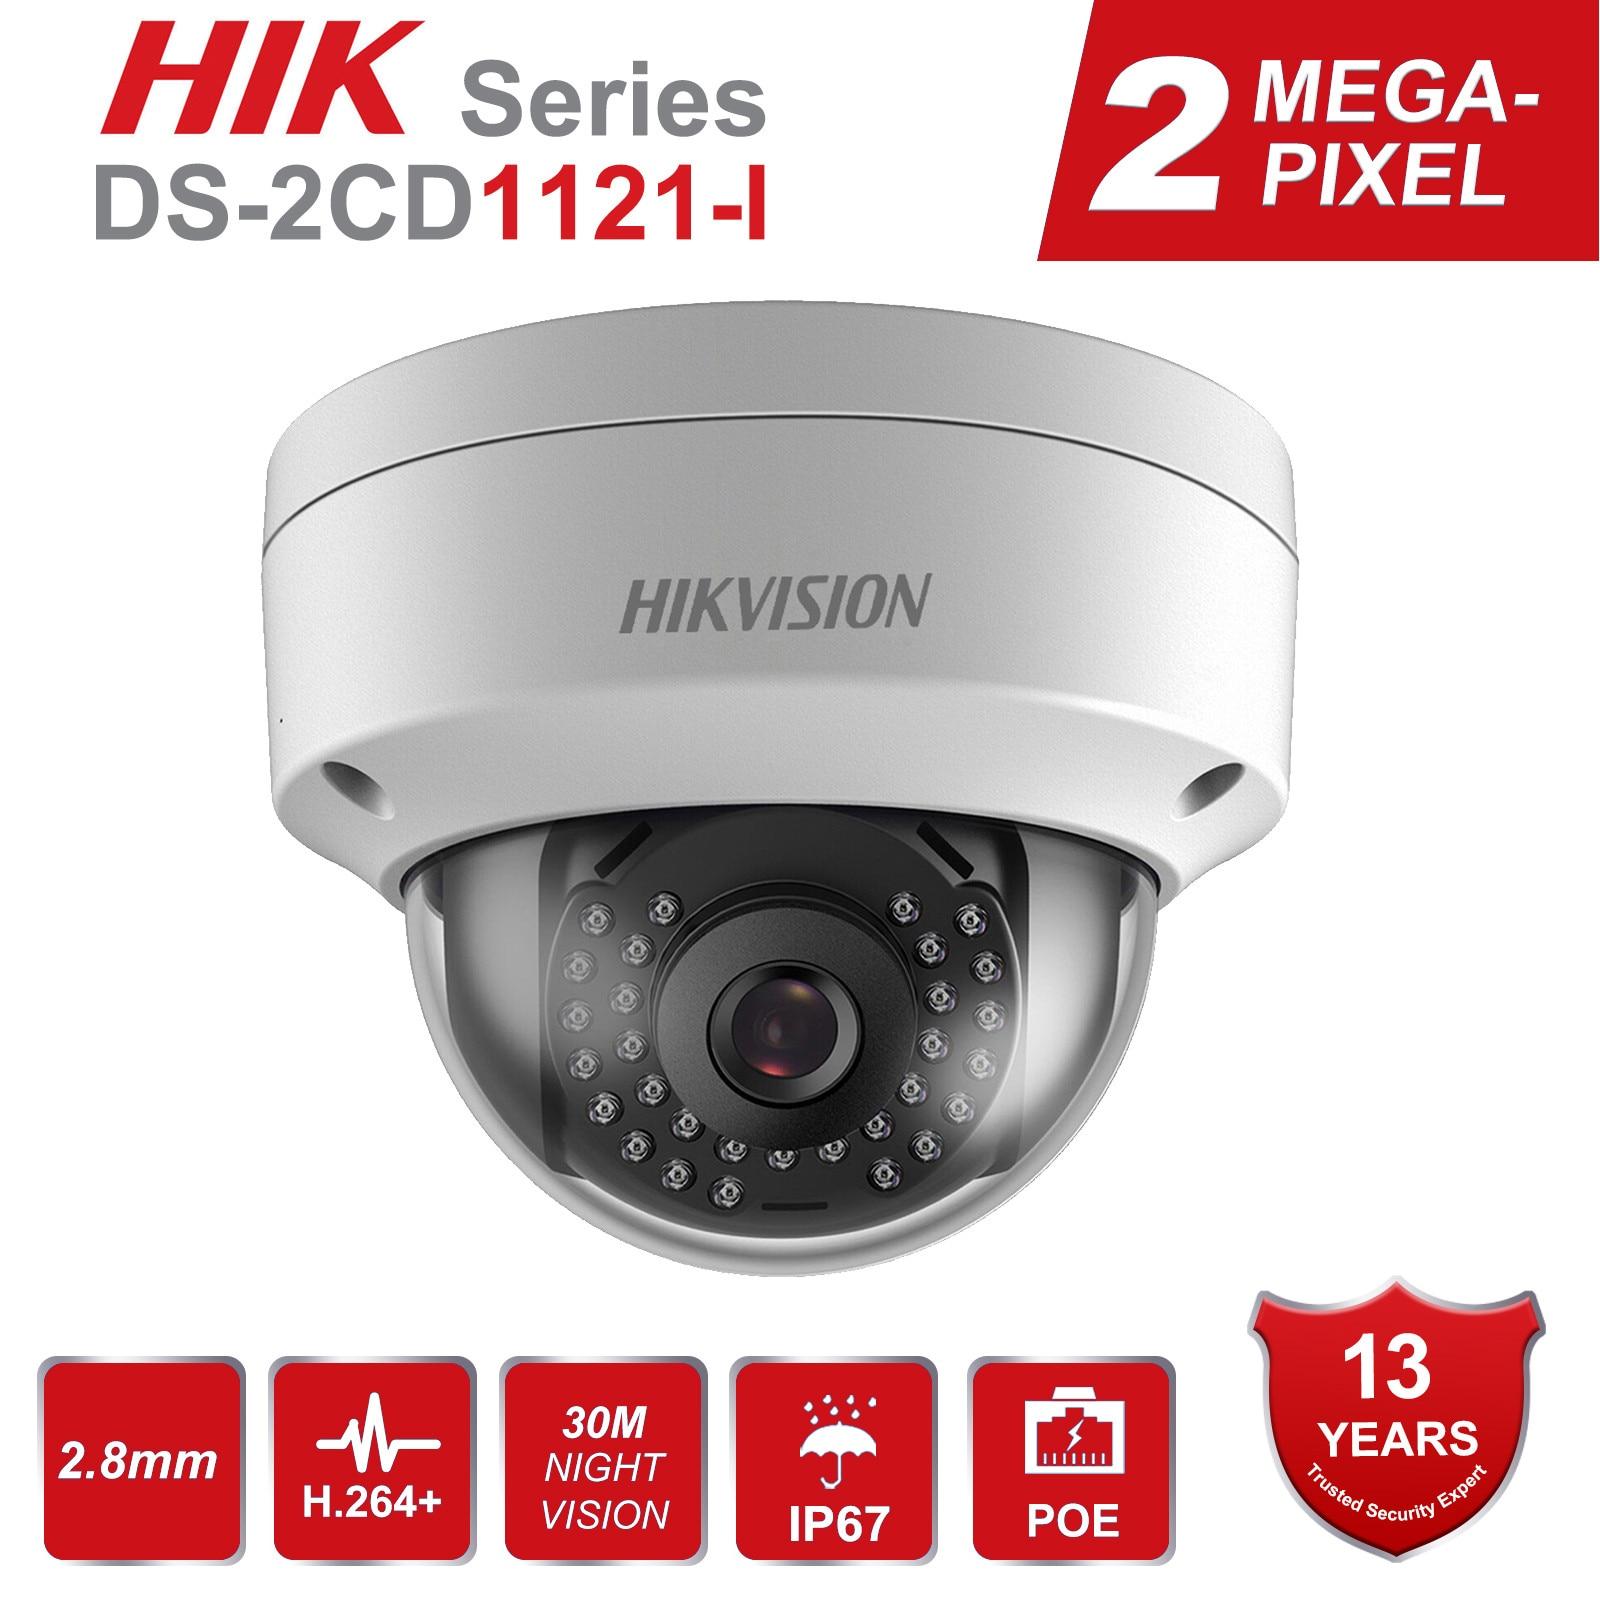 Hikvision 2MP PoE IP Camera DS-2CD1121-I & DS-2CD1123G0-I 1080P Security Dome Video Surveillance Camera Ru Stocks